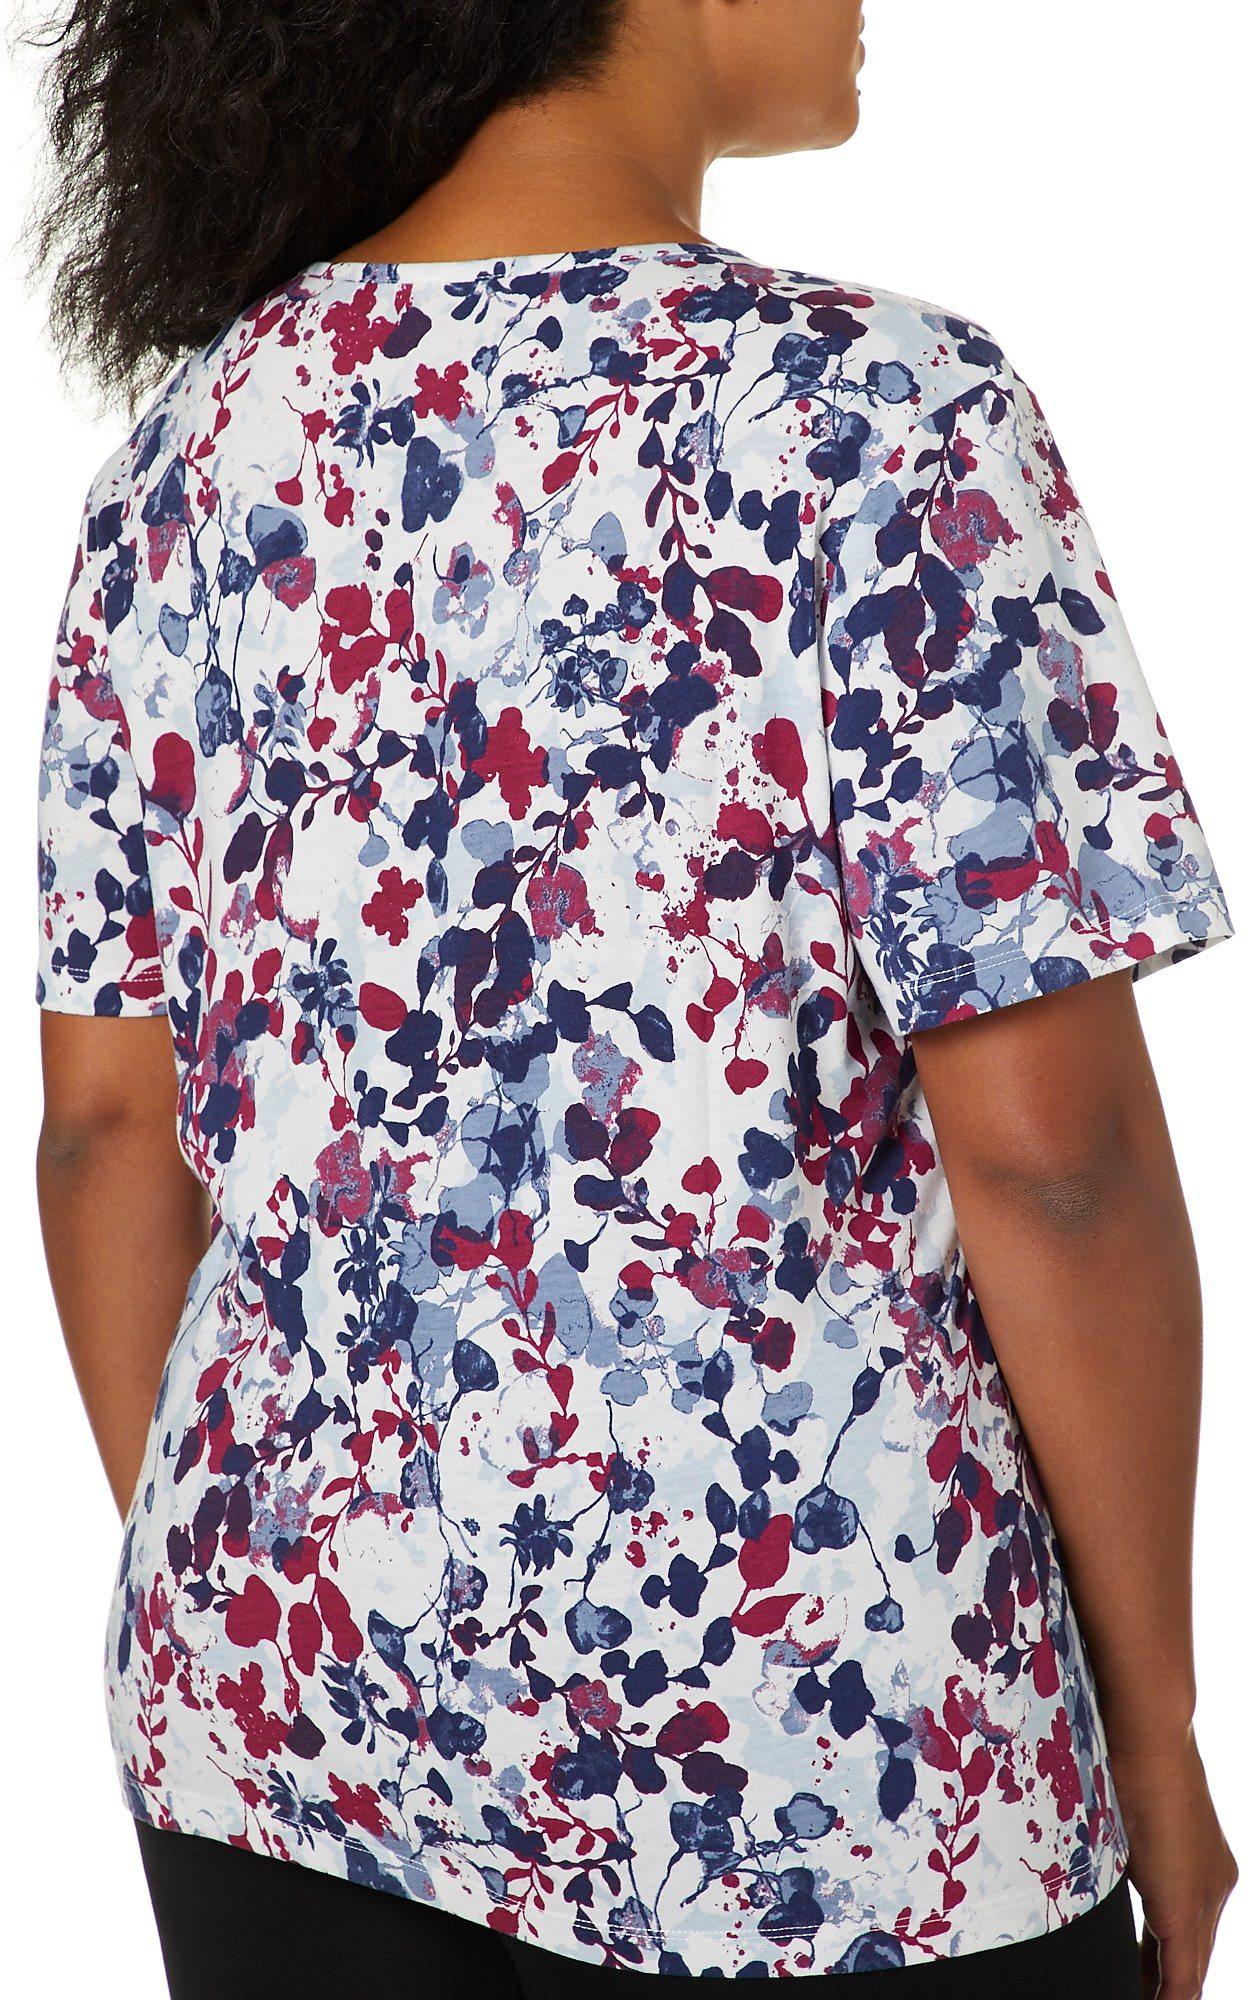 Coral Bay Plus Floral Print V-Neck Top